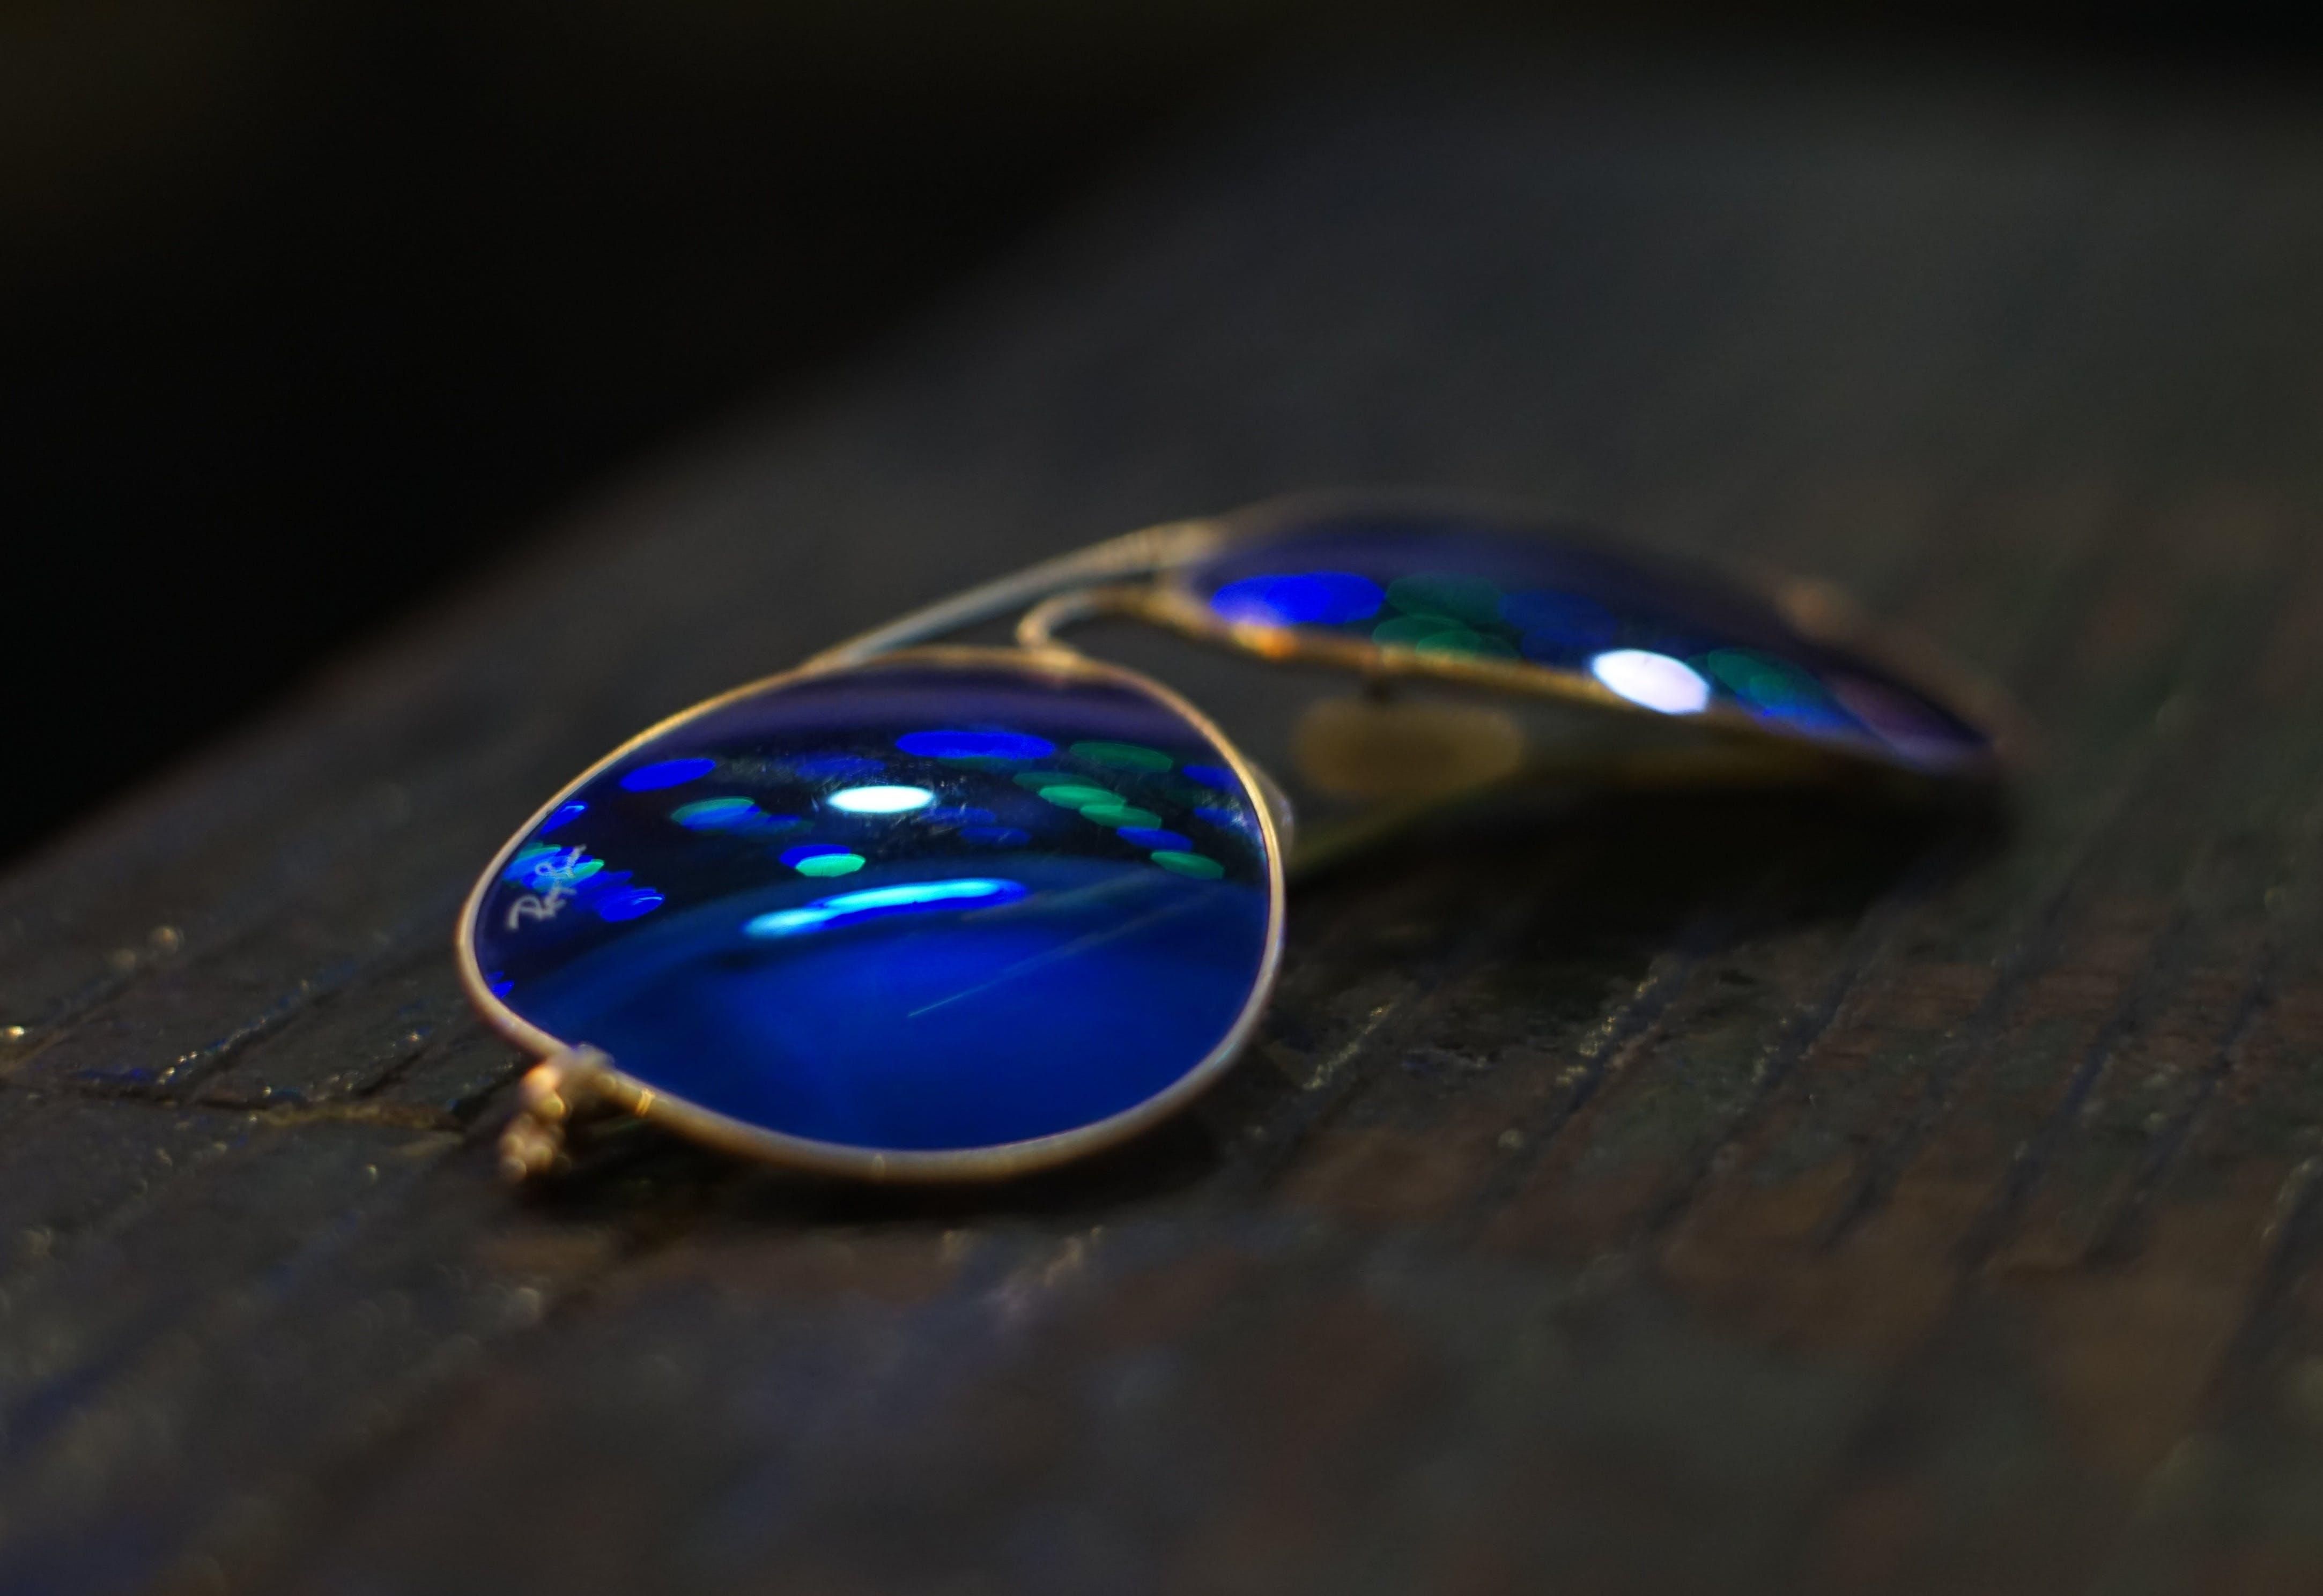 Free stock photo of aviator, aviator sunglasses, blue, ray ban